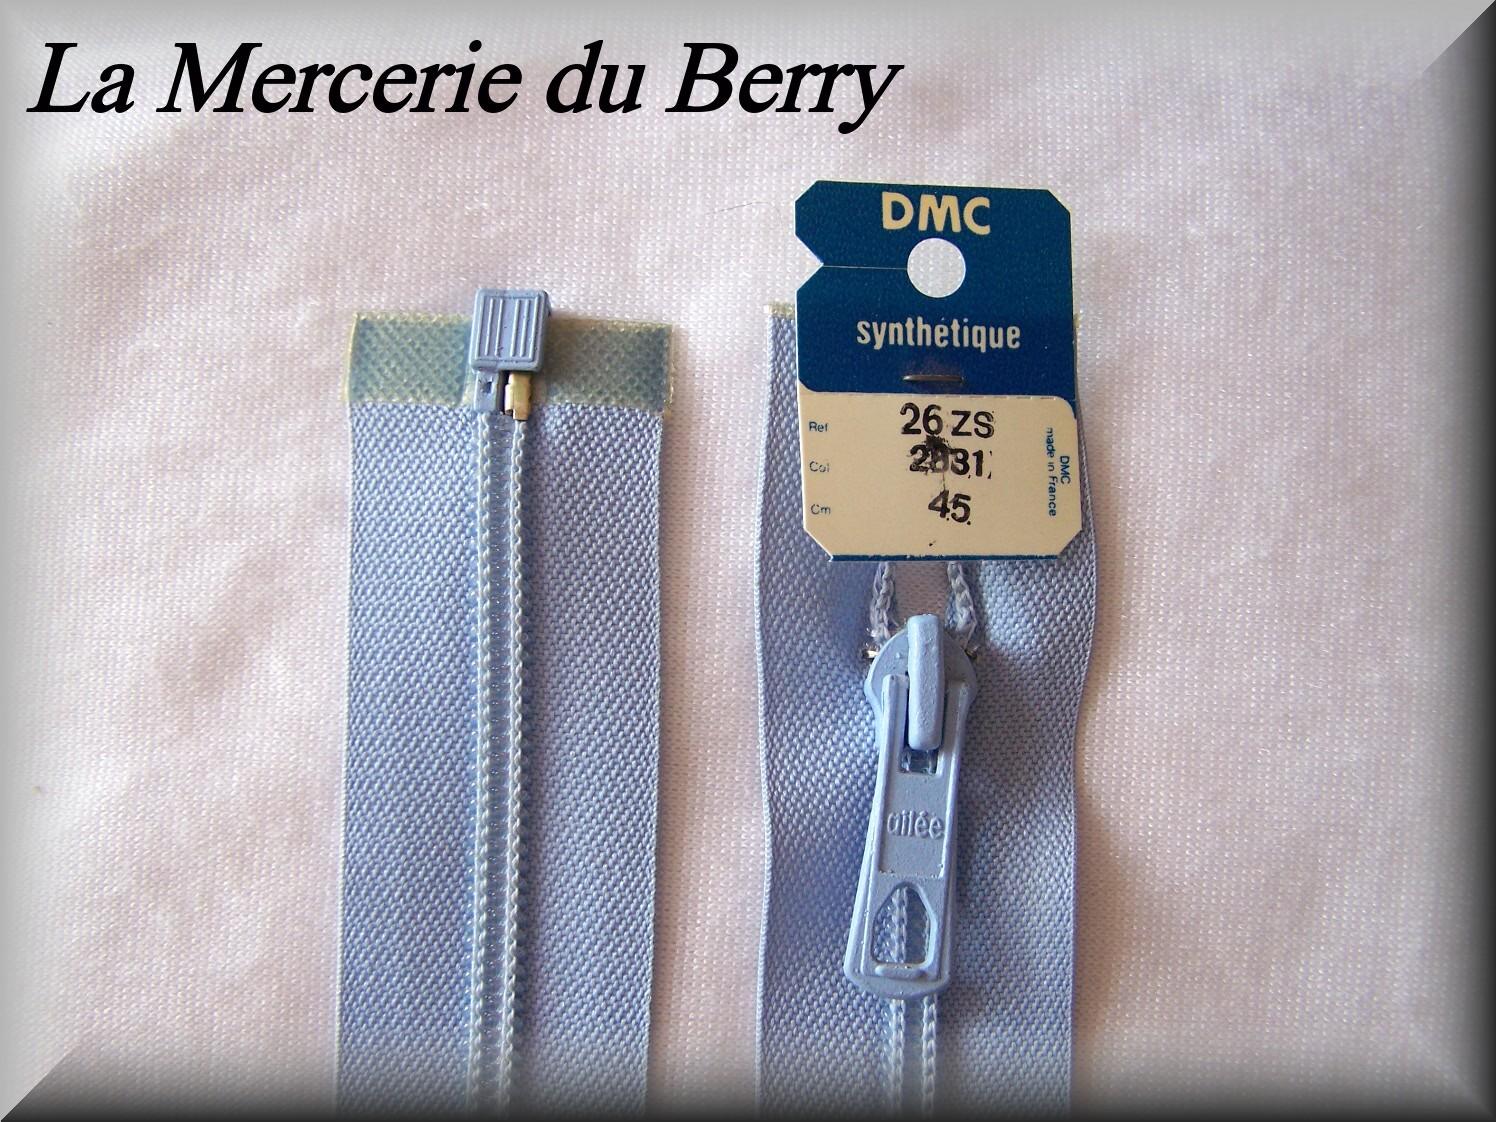 DMC-26ZS-2831